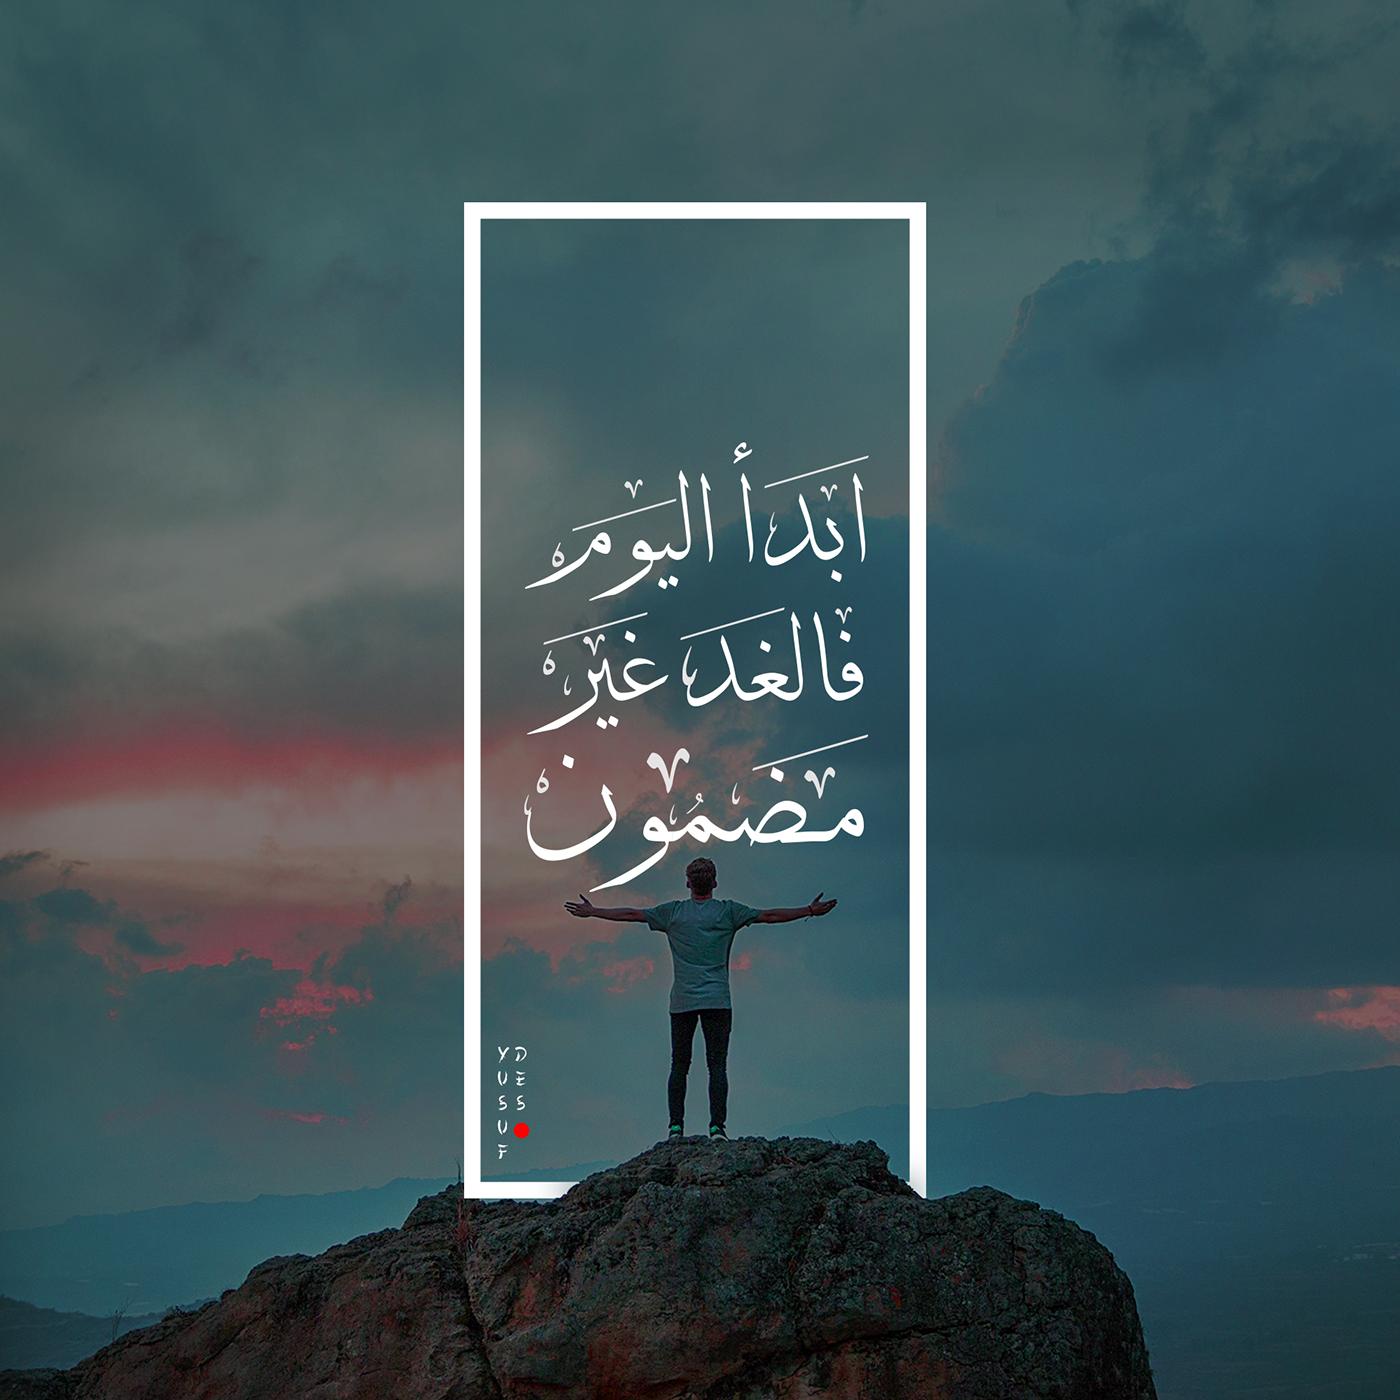 عبارات م لهمة متجدد On Behance Quotes For Book Lovers Cover Photo Quotes Beautiful Arabic Words